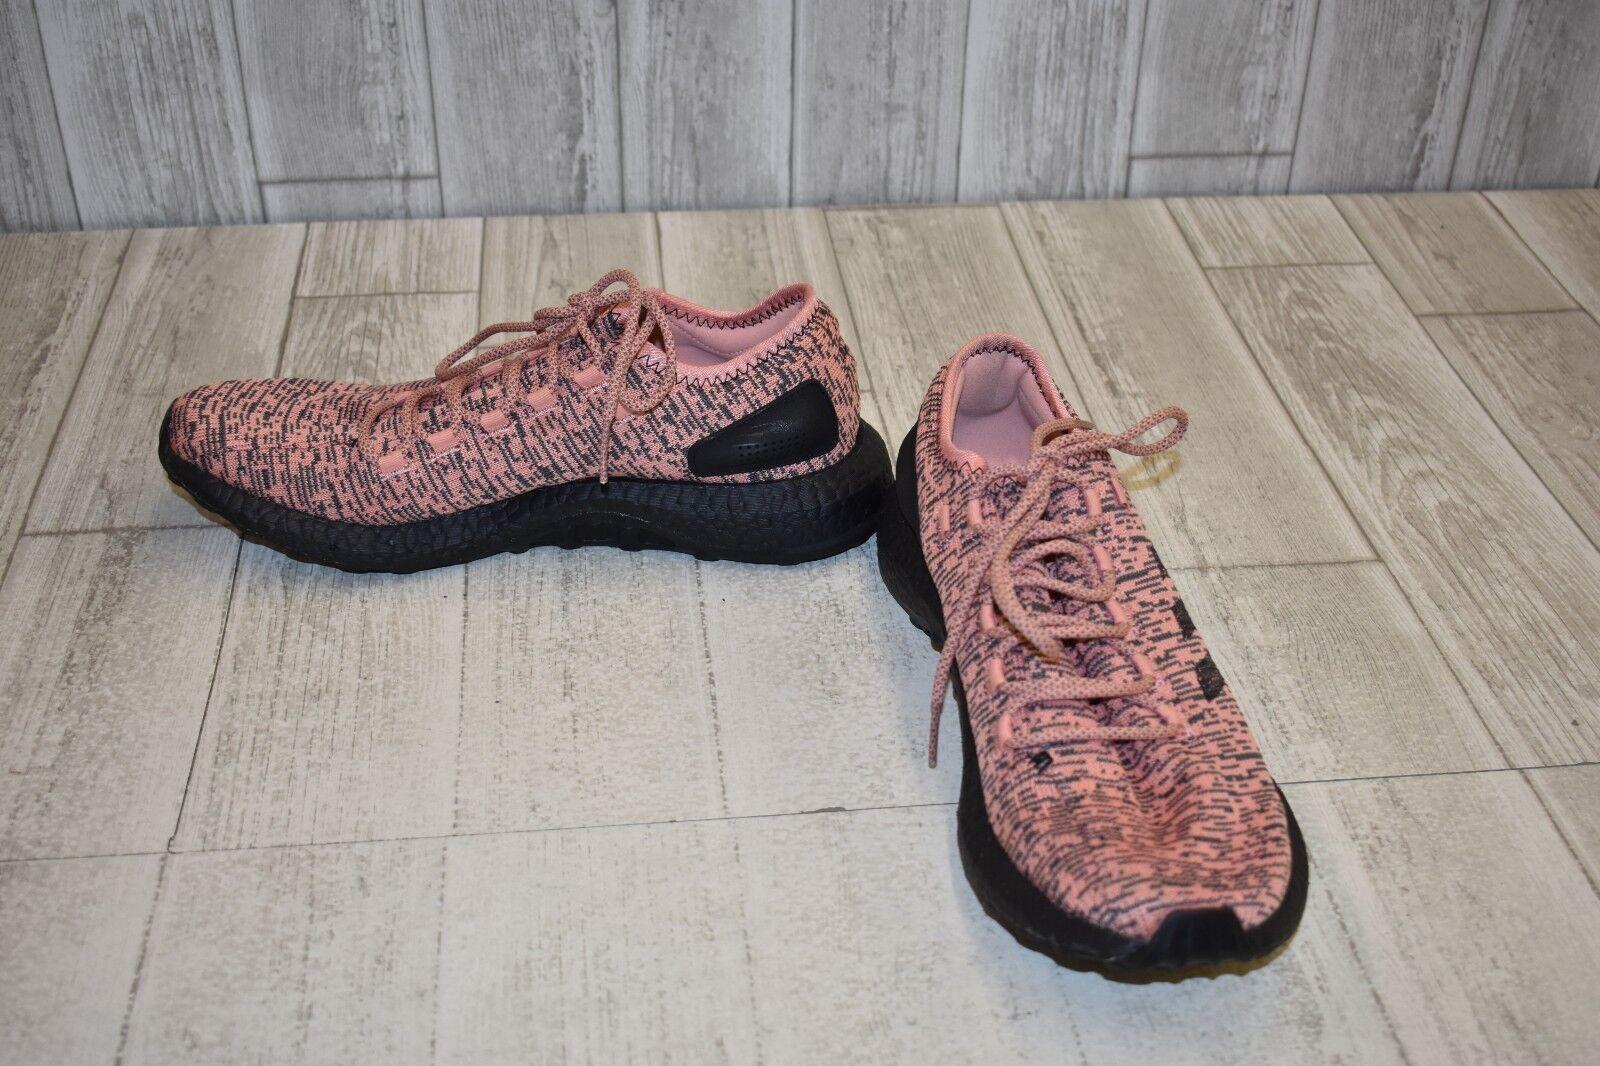 Adidas PureBoost Sneaker - Men's Size 12.5, Salmon